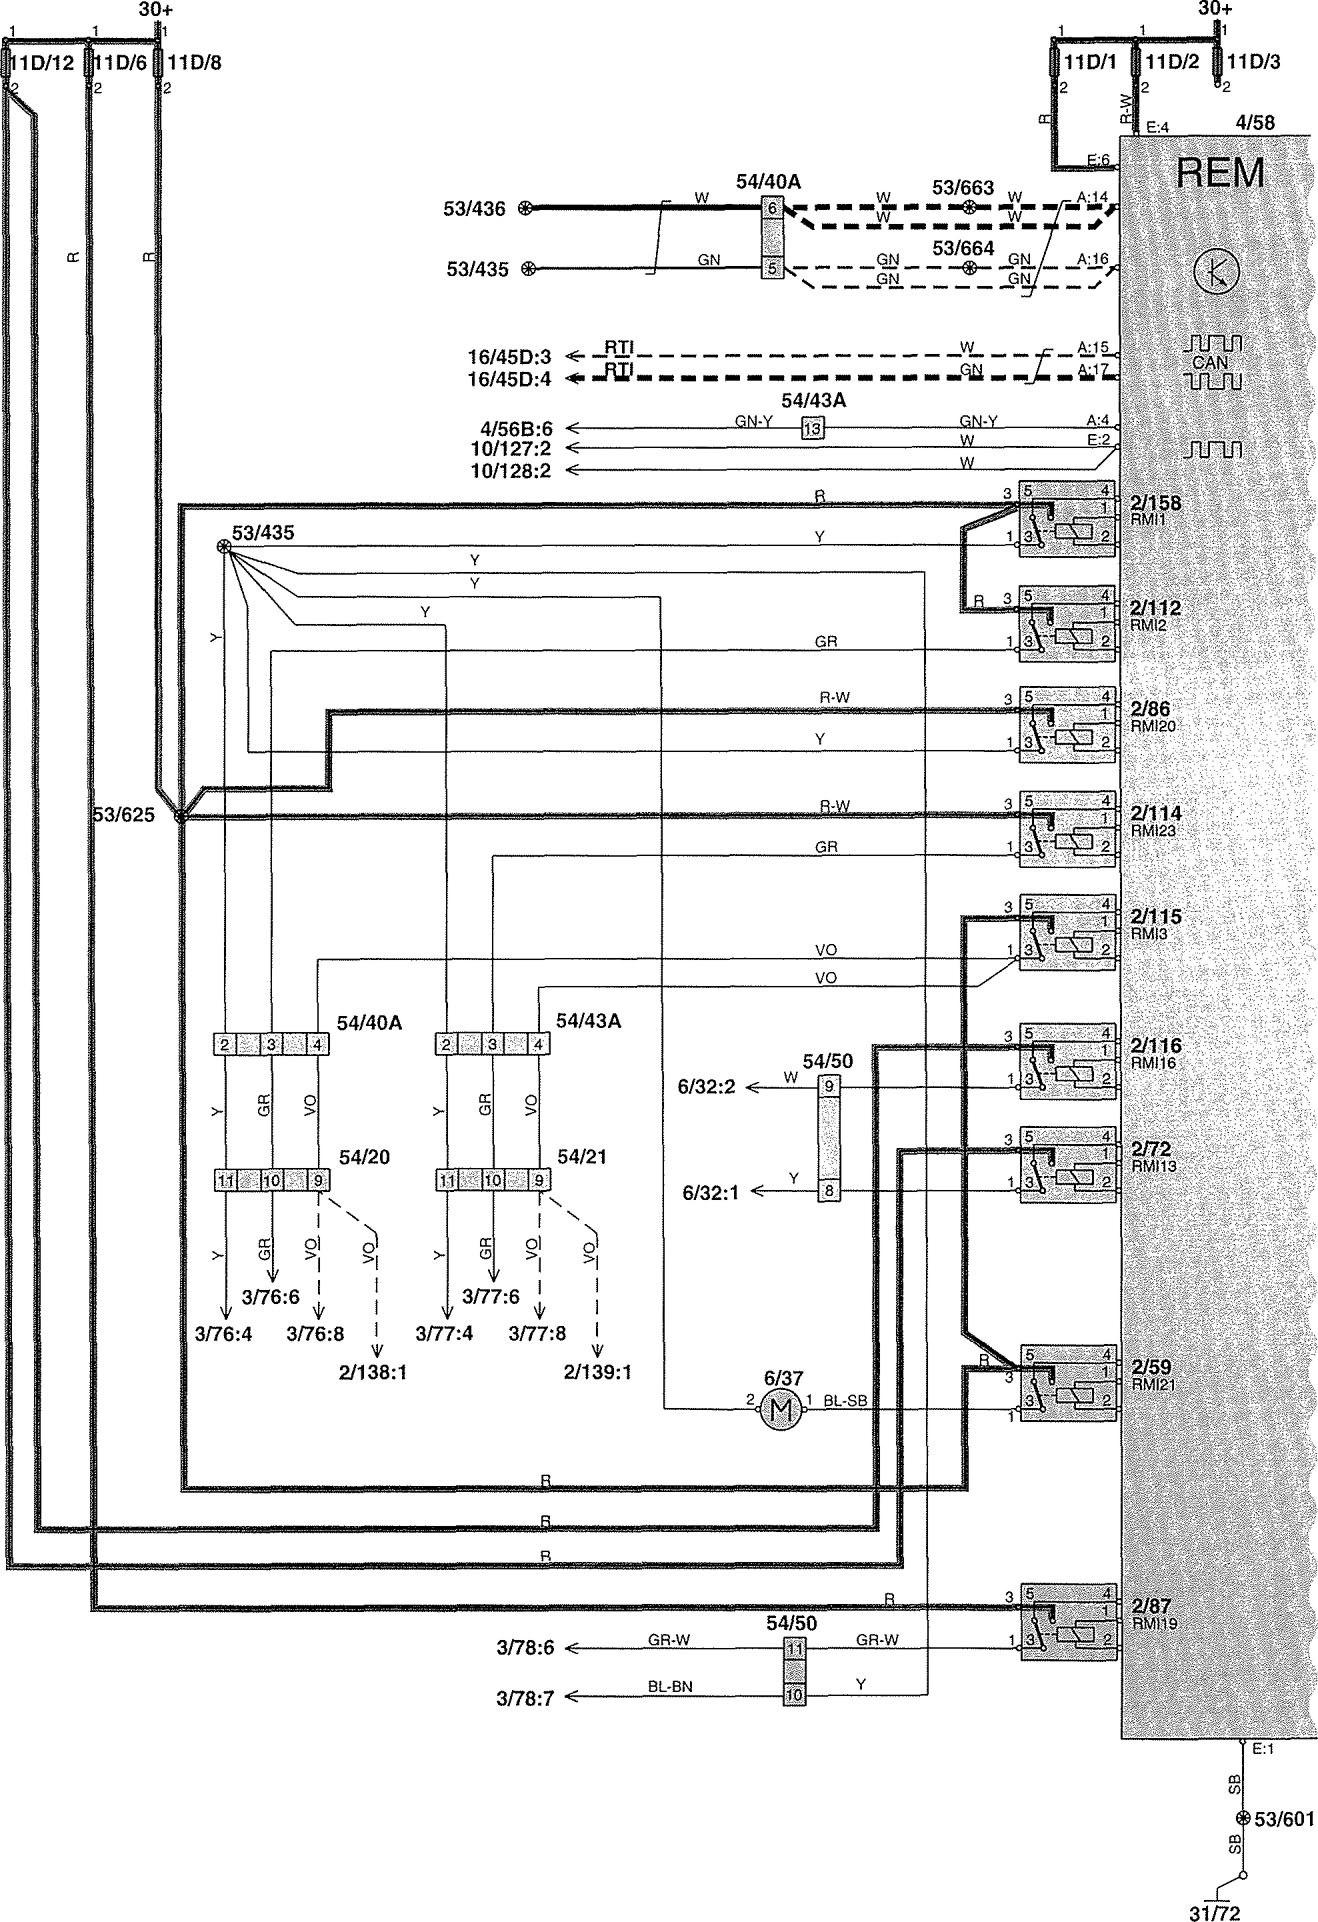 2001 Volvo V70 Xc Wiring Diagram - Wiring Diagram Liry on